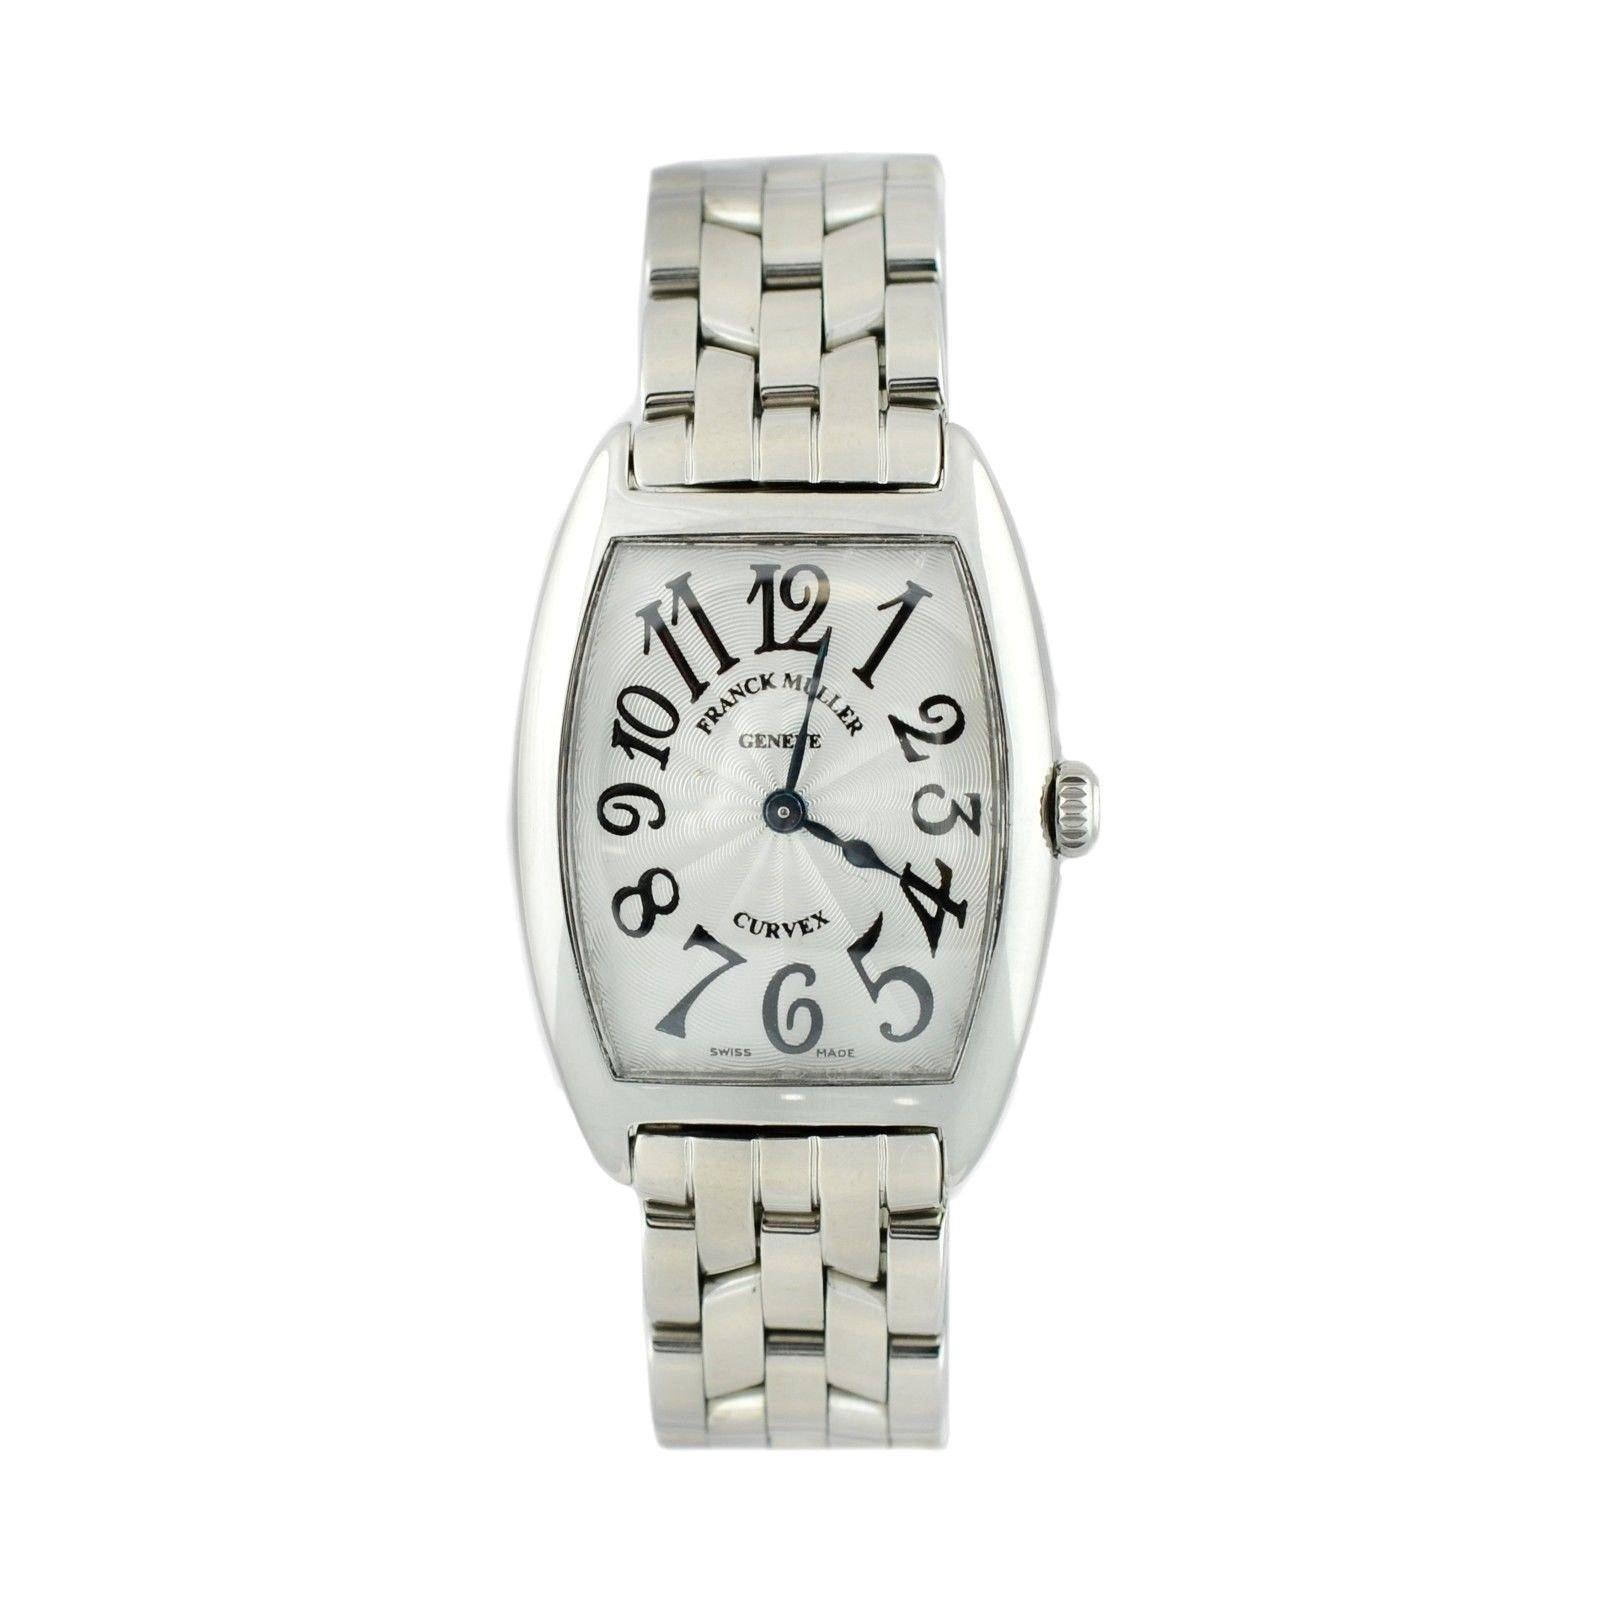 Franck Muller Curvex analog-quartz womens Watch 1752 QZ (Certified Pre-owned)